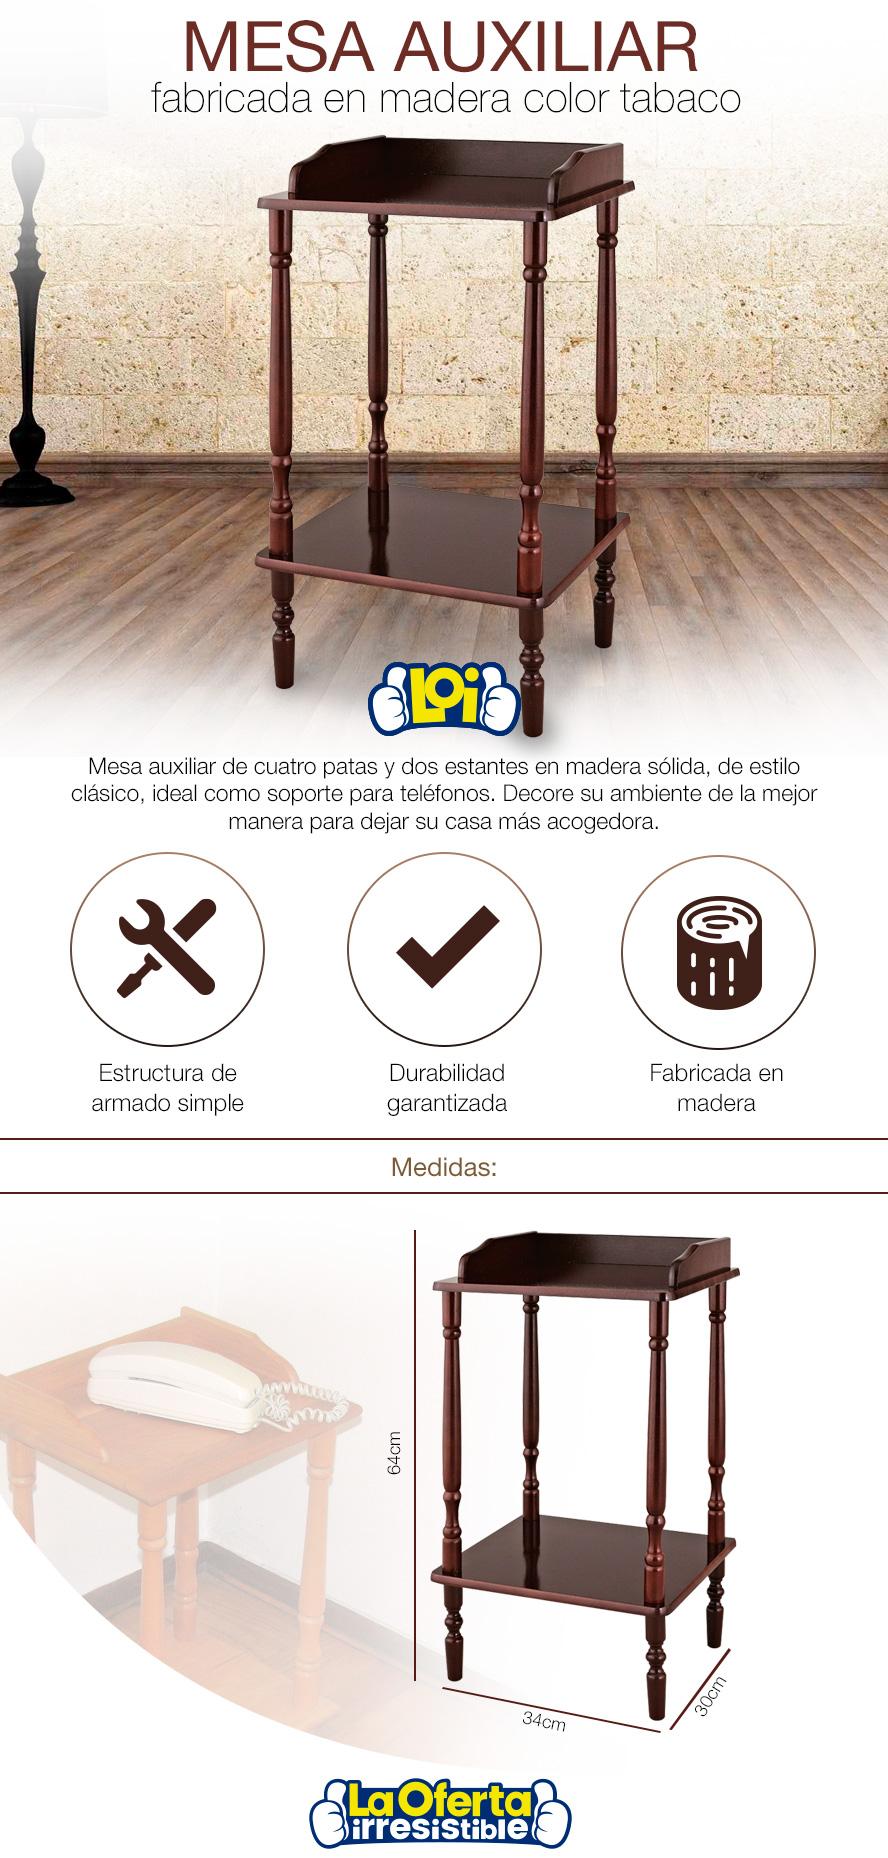 Mesa auxiliar fabricada en madera color tabaco oferta loi - Mesa auxiliar carrefour ...